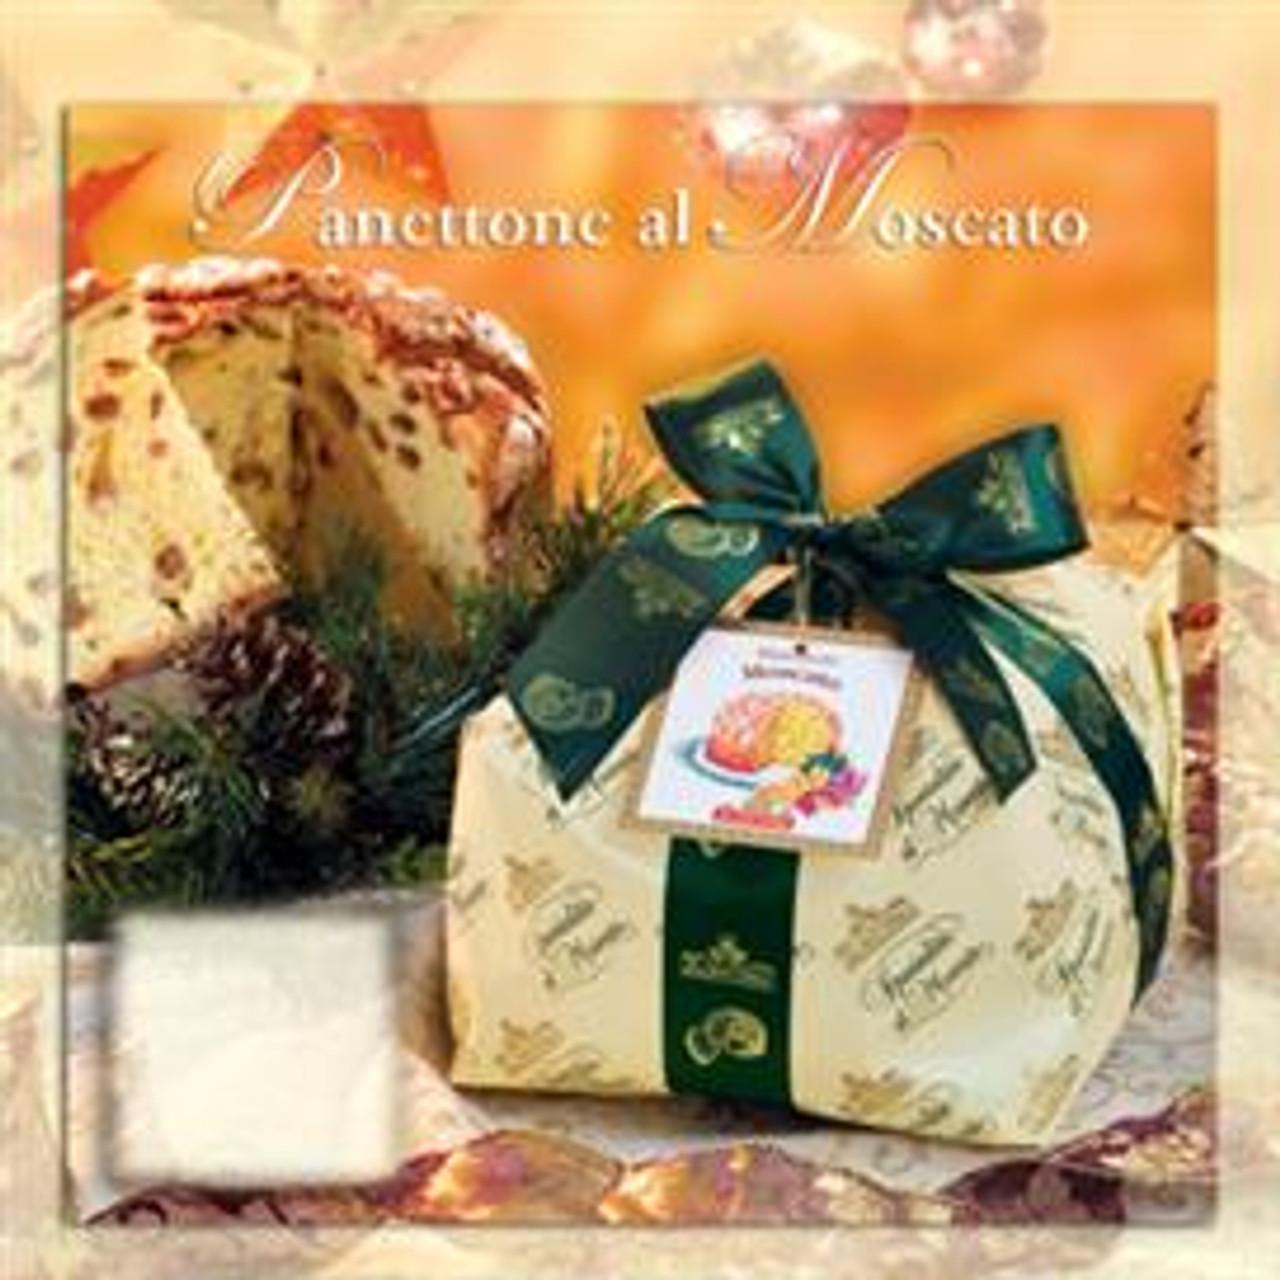 Albertengo Moscato Panettone